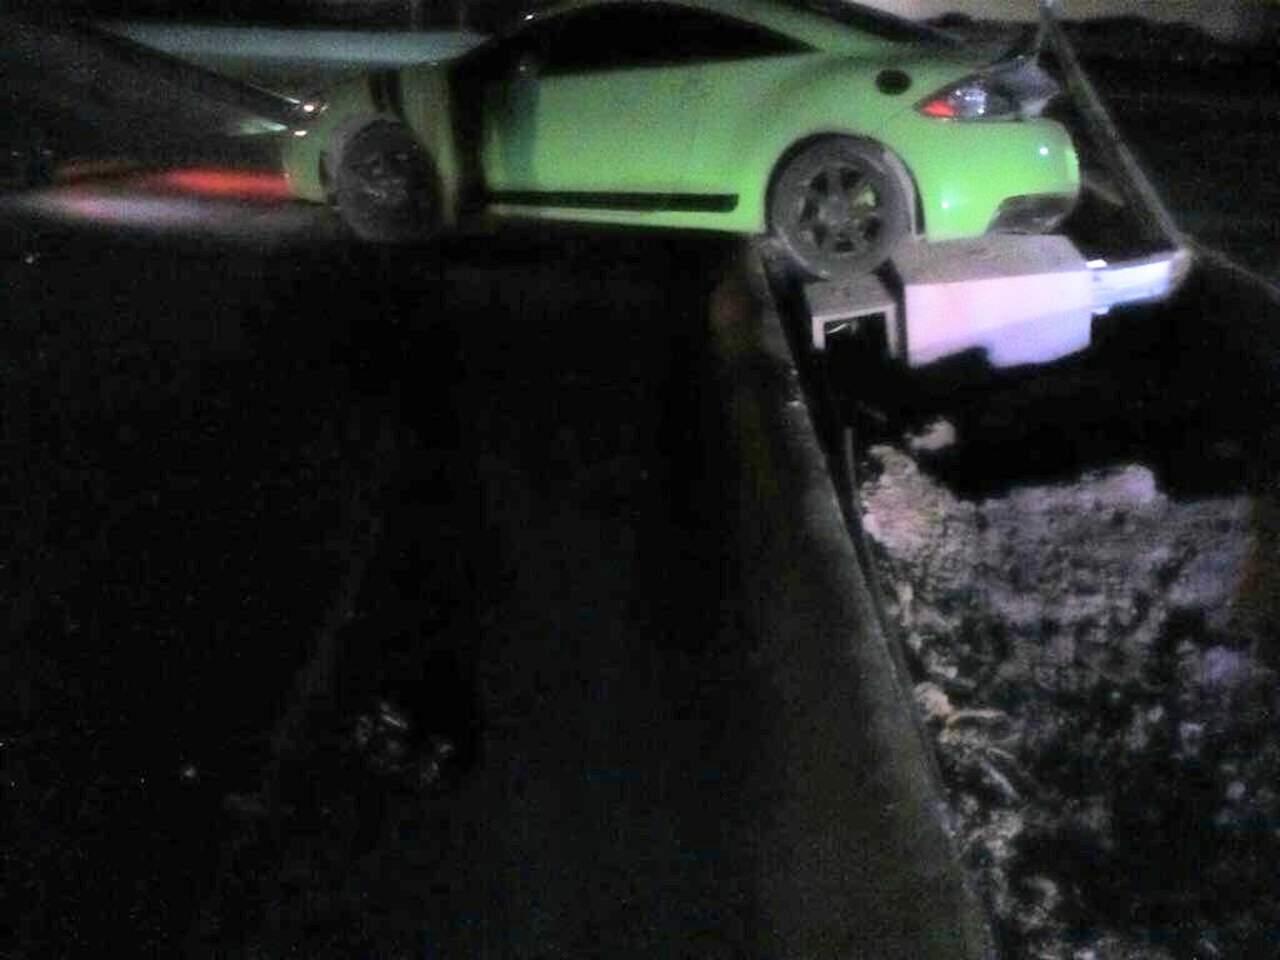 Conductor ebrio derriba luminaria en Torreón